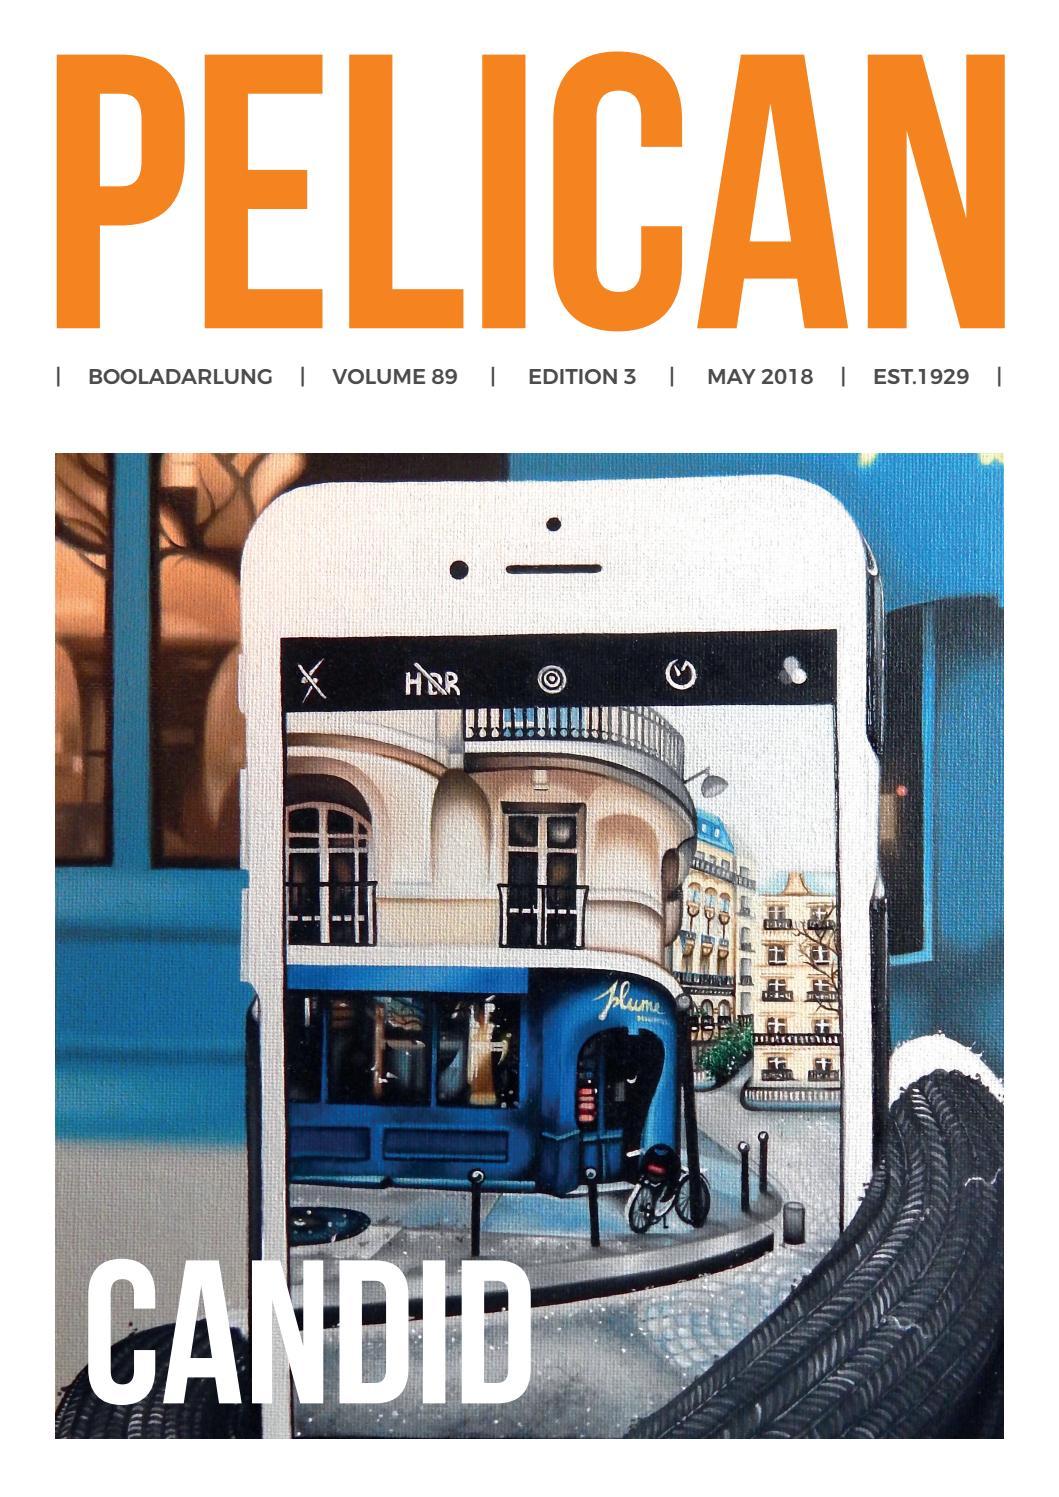 Pelican edition 3 by UWA Student Guild - issuu 70dfa96567cf5